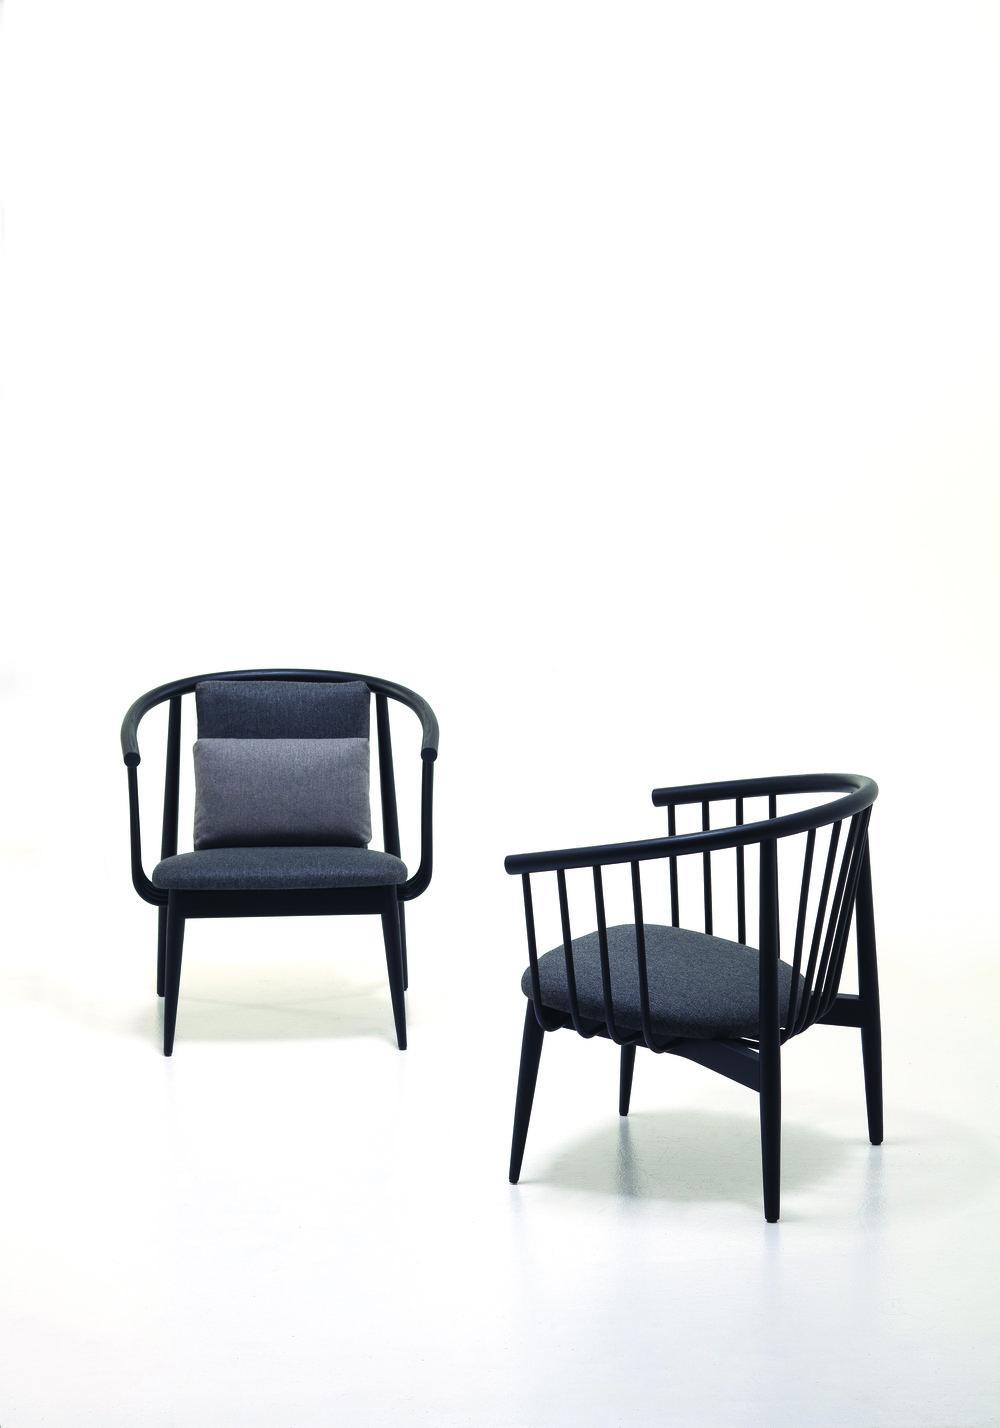 Tivoli-Lounge-3.jpg